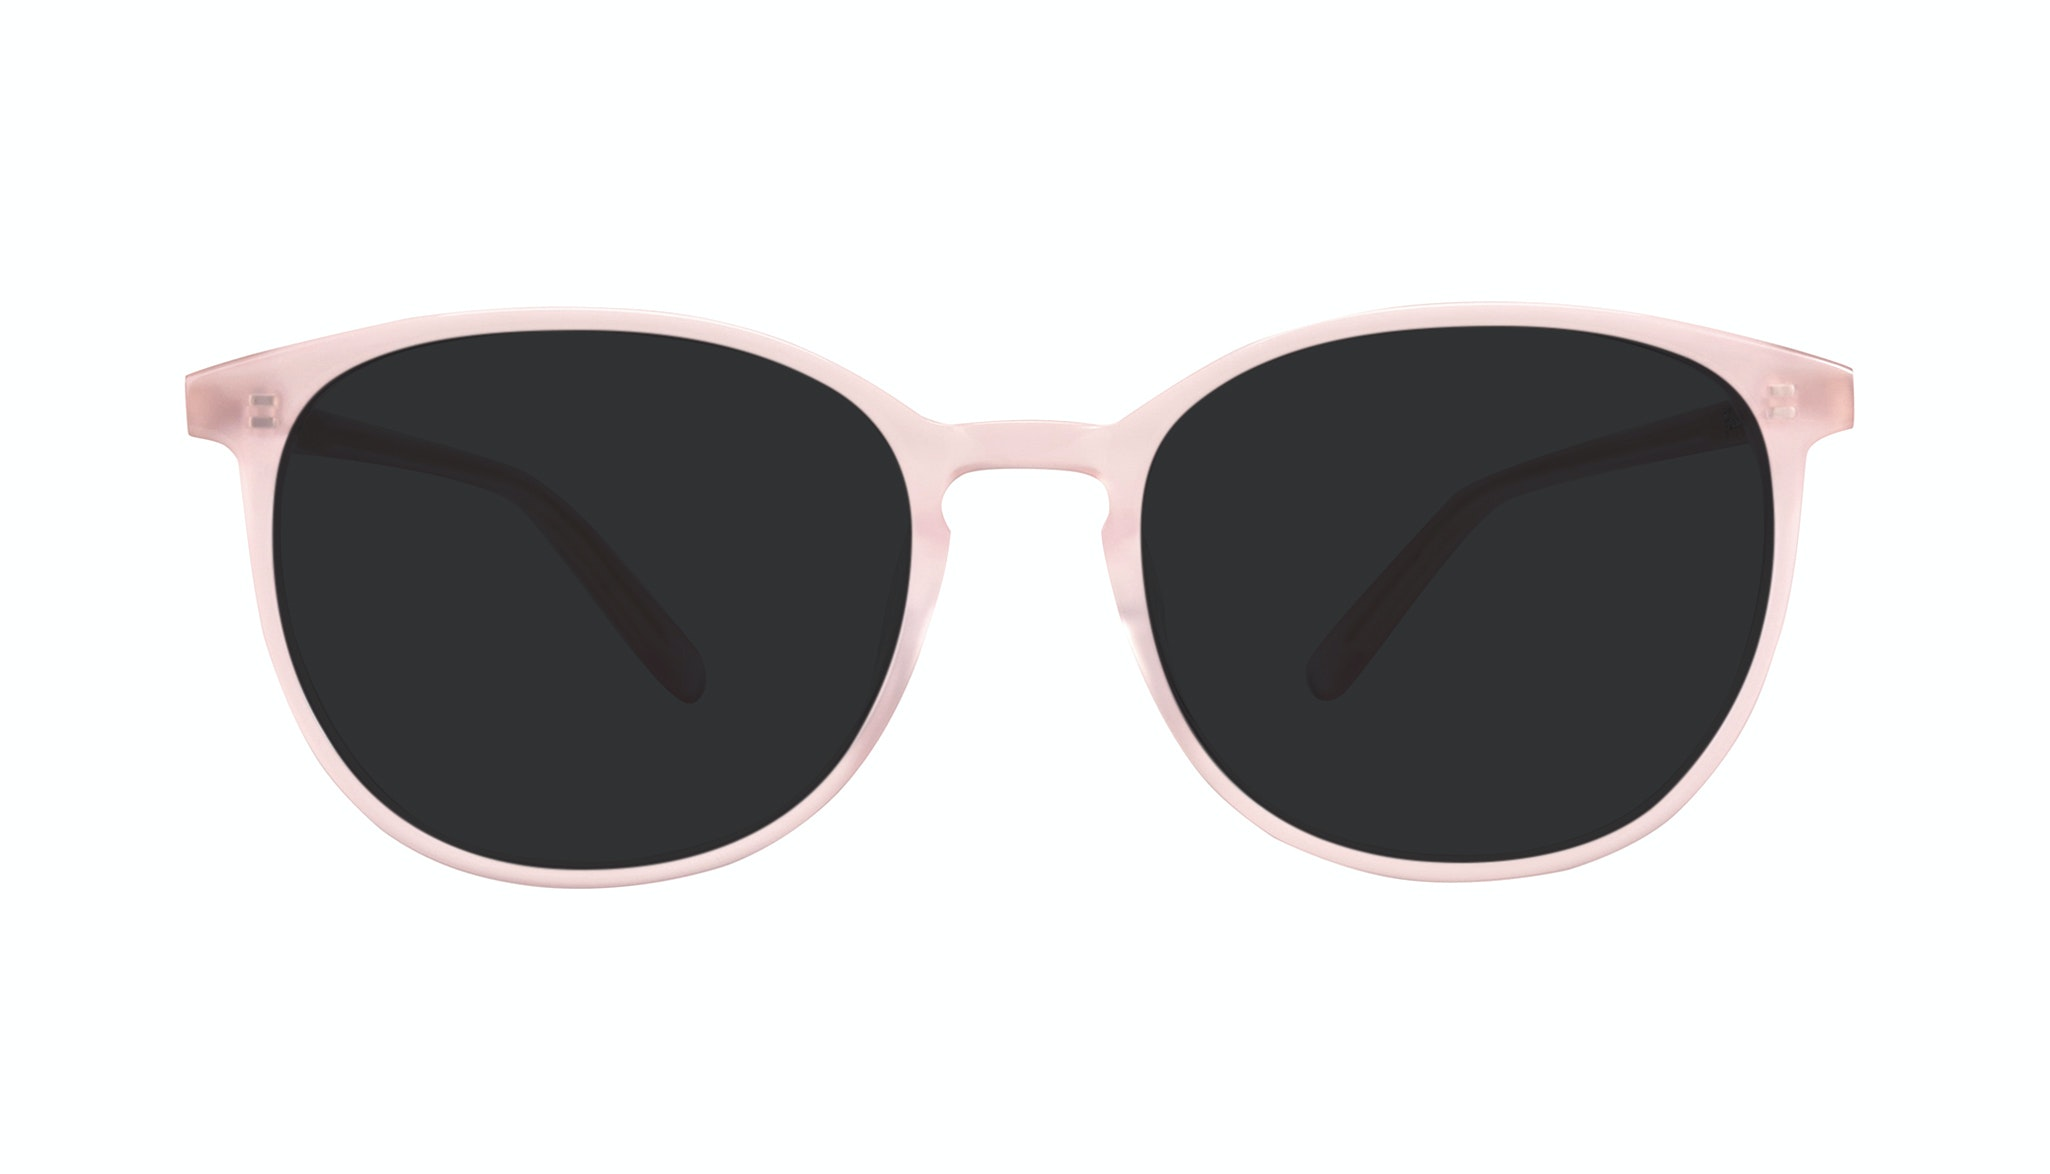 Affordable Fashion Glasses Round Sunglasses Women Femme Libre Mila